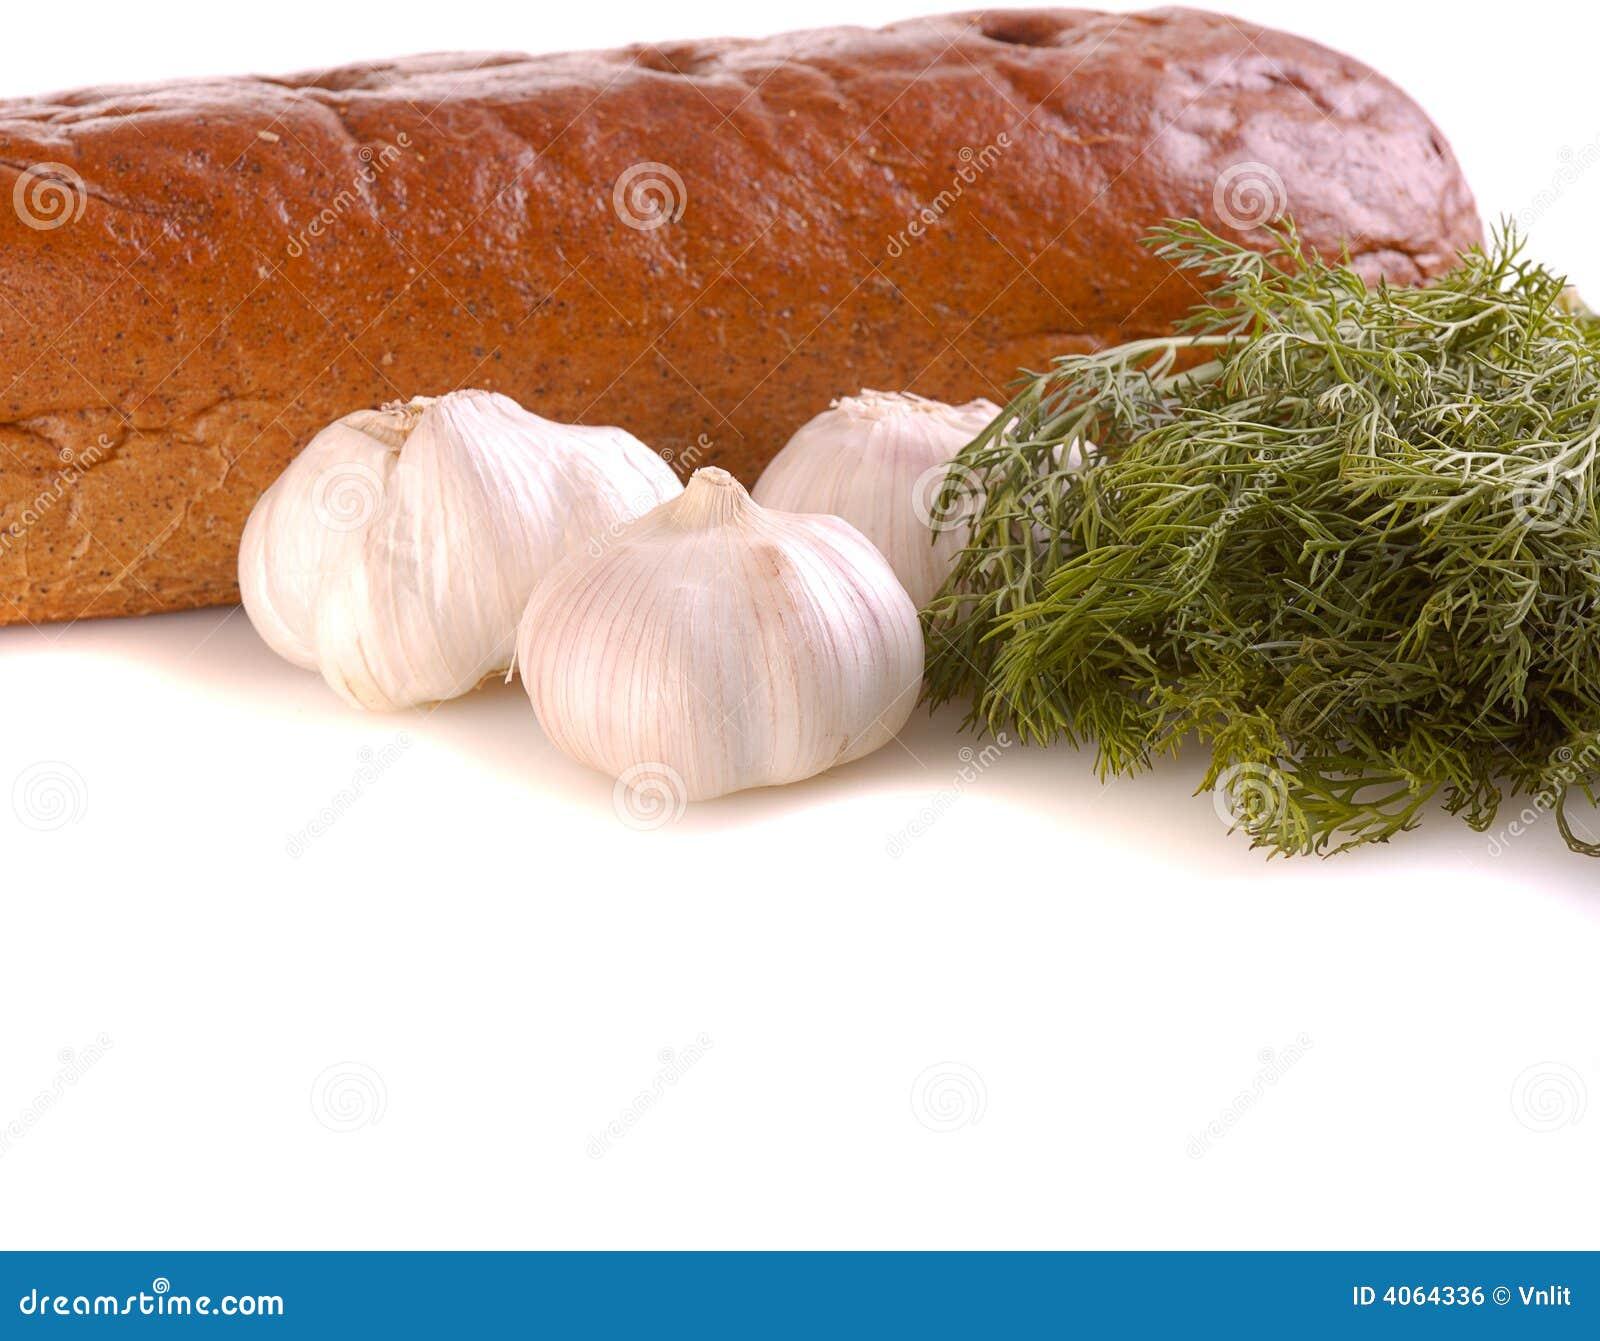 Bread and garlic